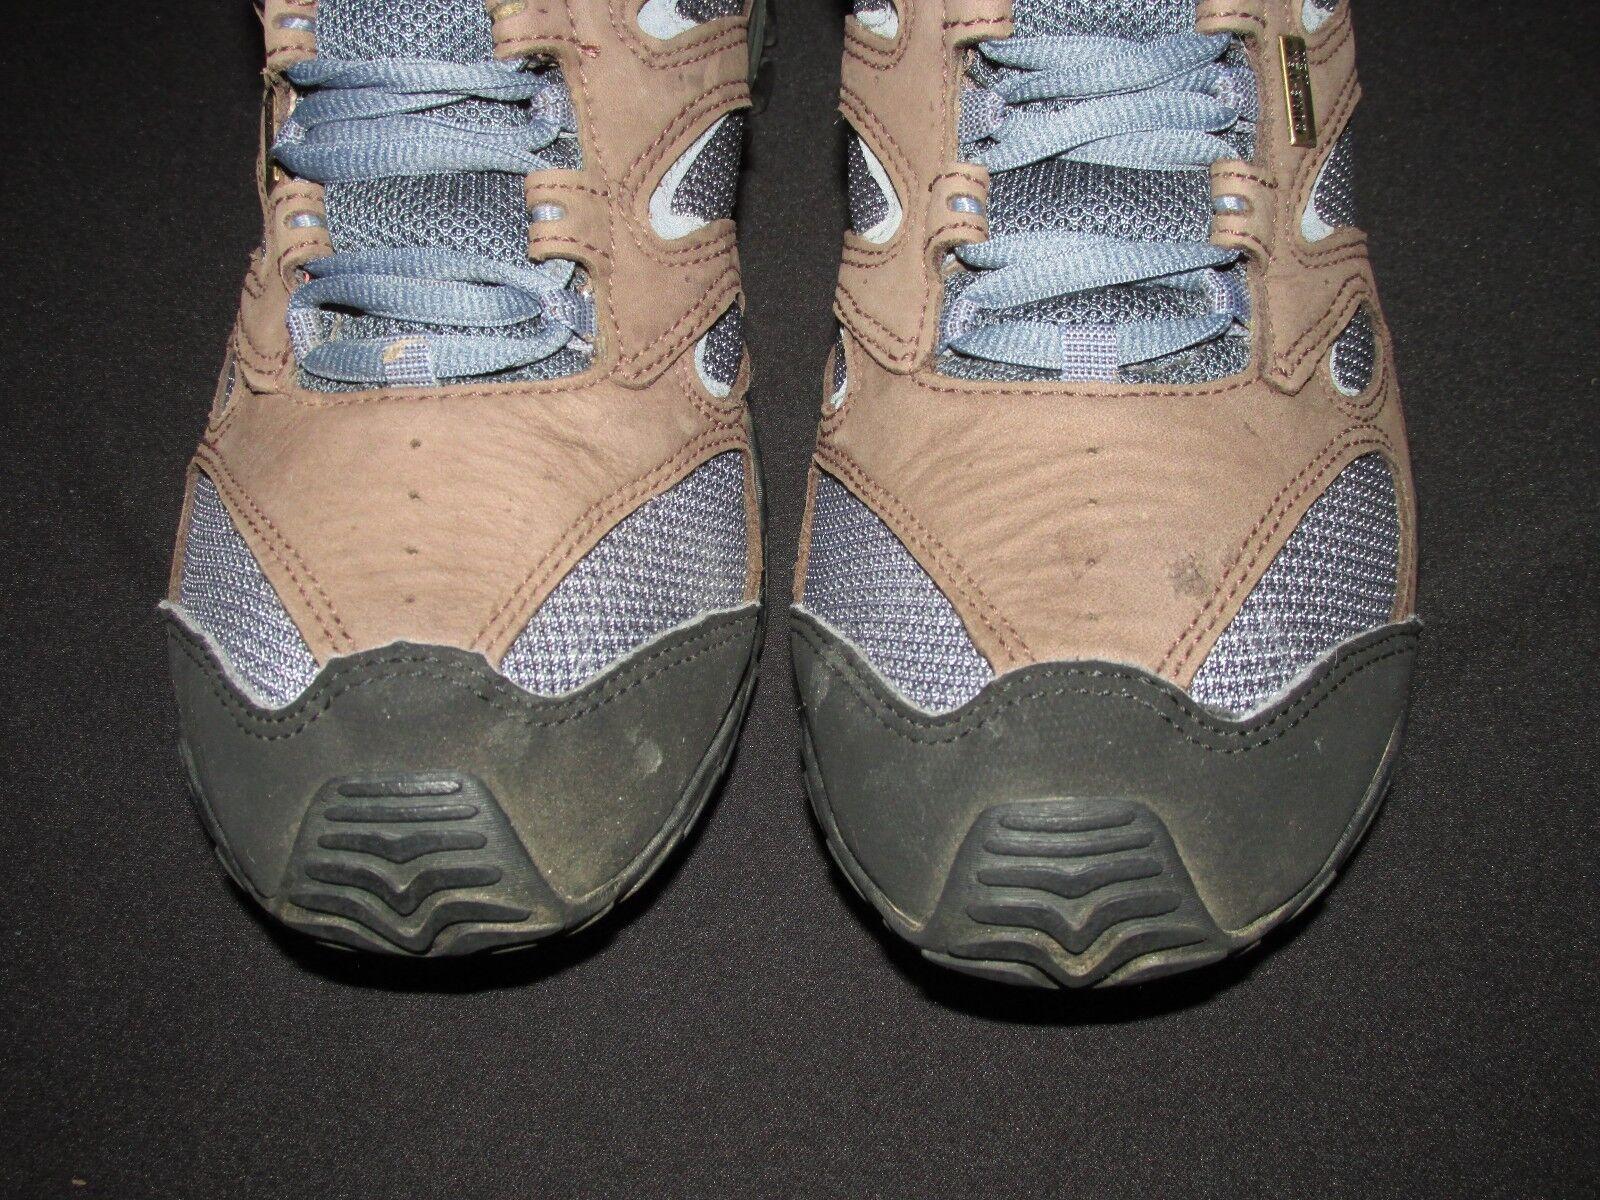 Merrell Passage Gore-Tex XCR Fudge  Hiking Trail scarpe stivali stivali stivali Donna  10M f6e146